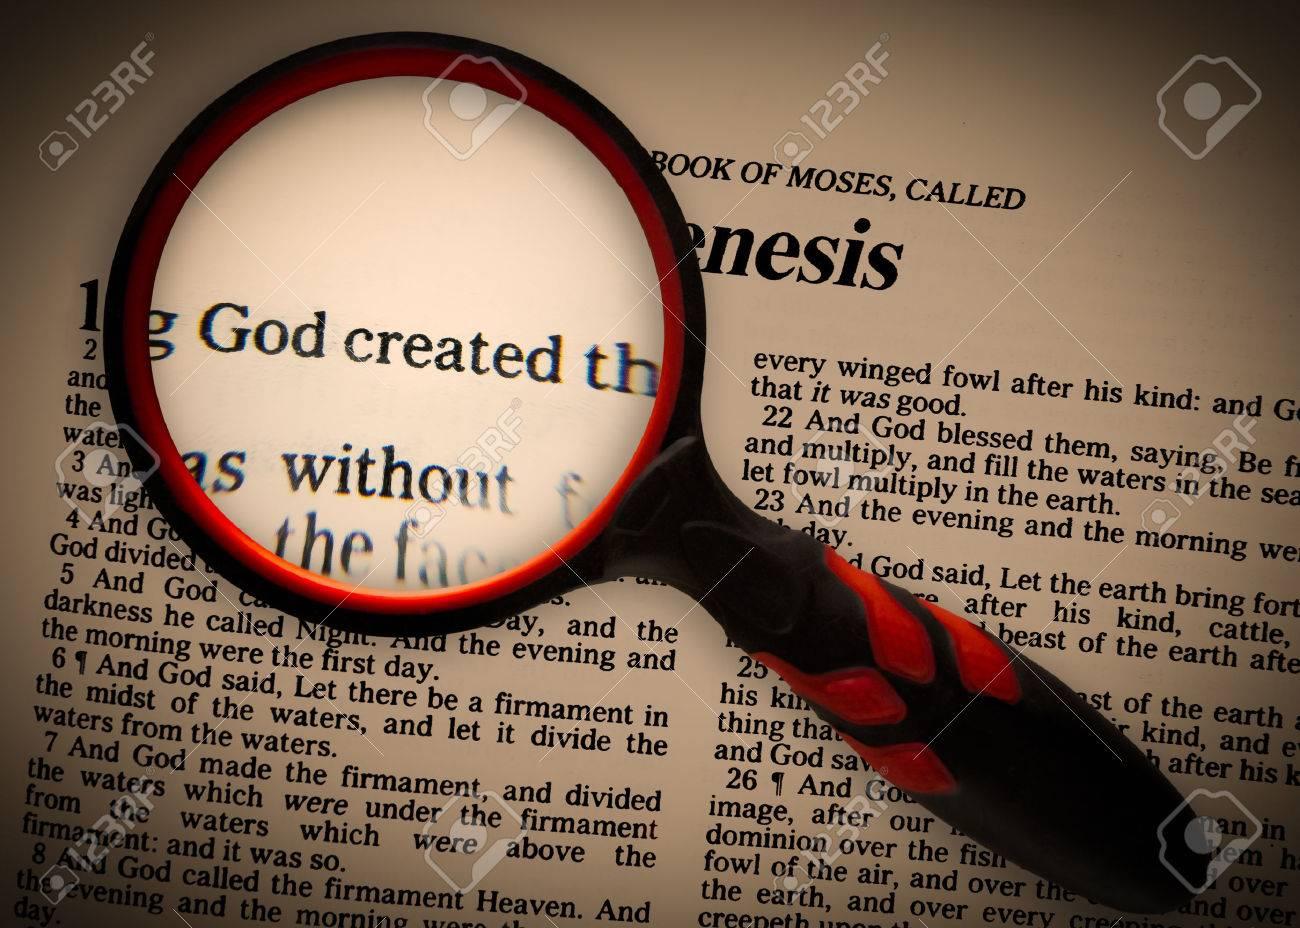 a focus on Genesis 1v1, that God created. - 43011329